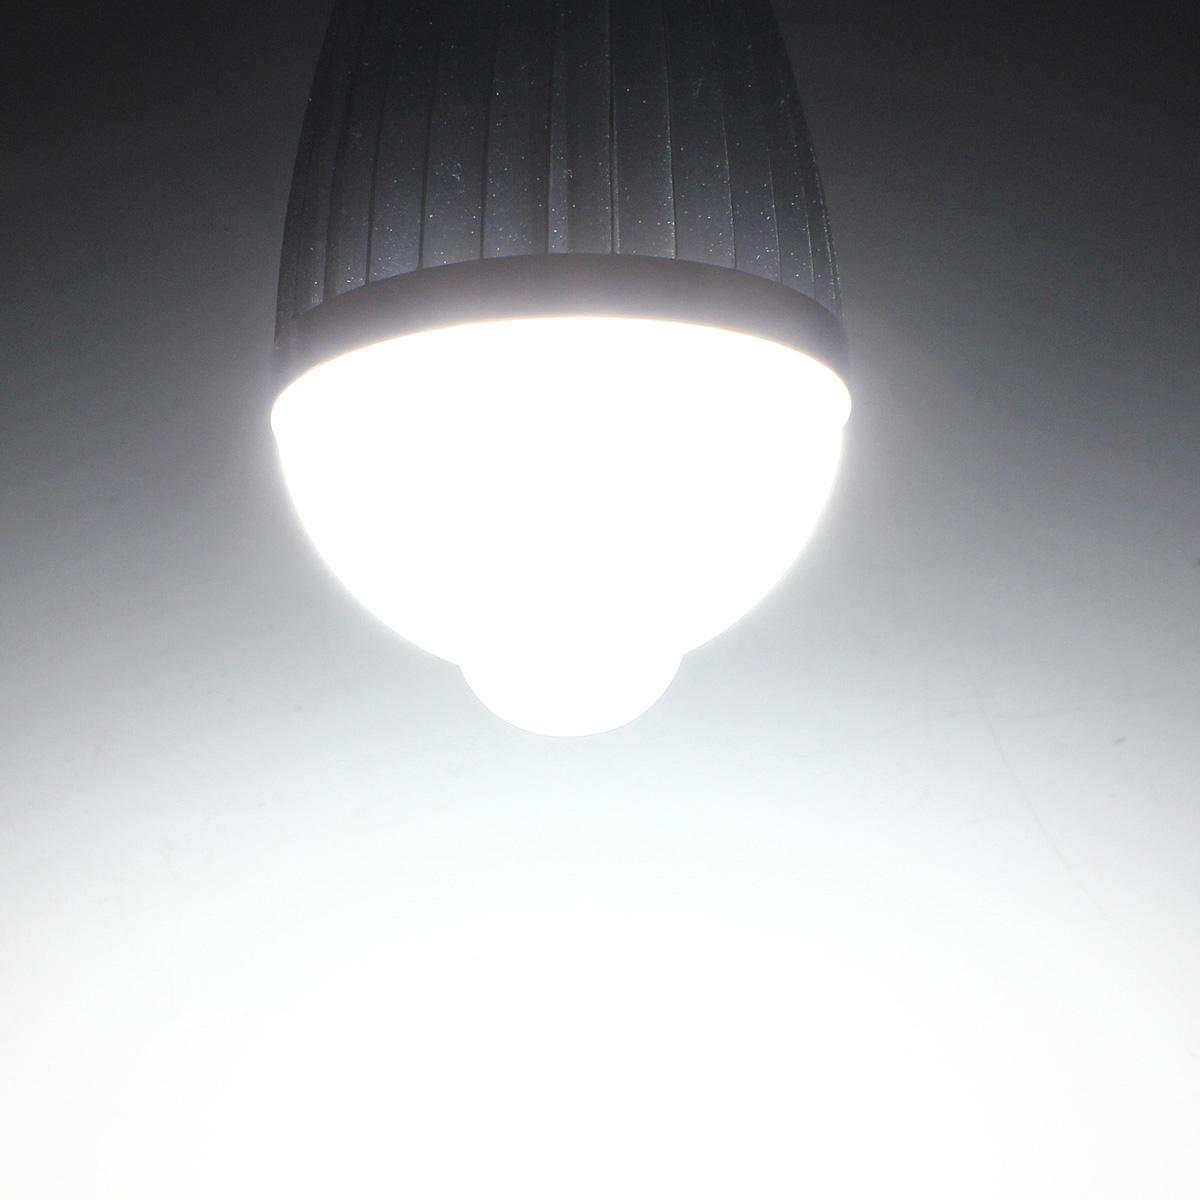 e27 5w 7w 9w led infrarot bewegungsmelder pir sensor licht lampe birnen leuchte ebay. Black Bedroom Furniture Sets. Home Design Ideas